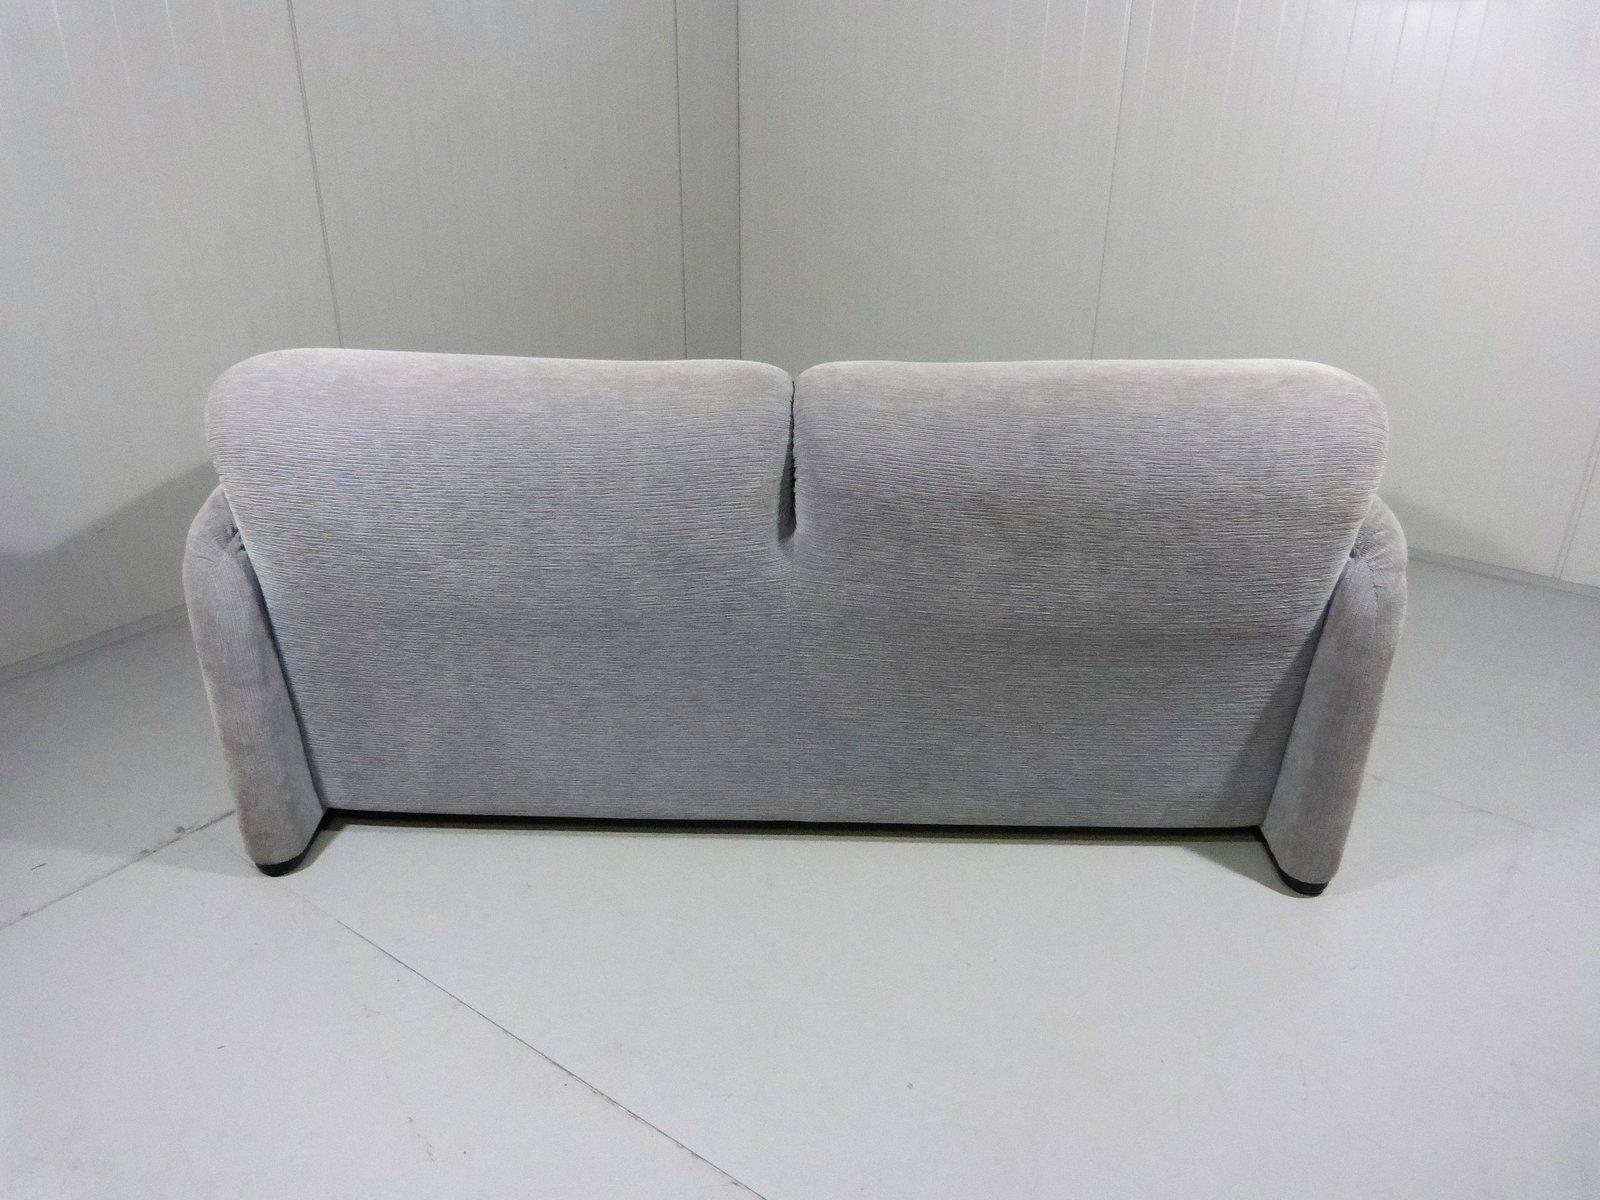 Vintage maralunga 2 seater sofa by vico magistretti for for Sofa 8 cassina